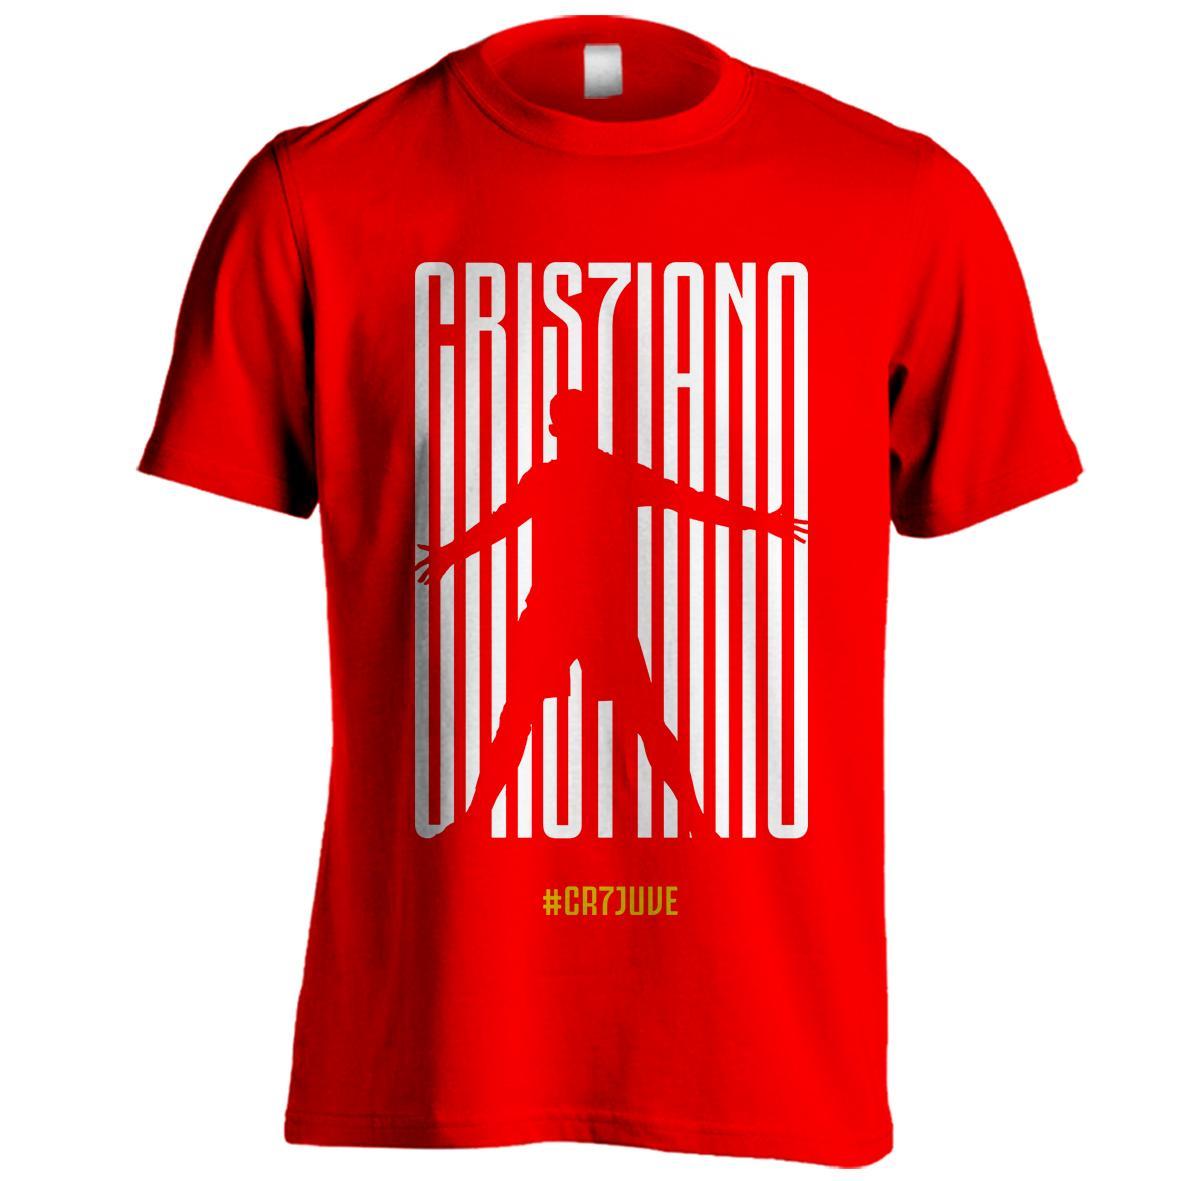 Fitur Kaos Baju Bola Juventus Campioni D Italia 7 Times 2018 Tshirt Juve New Logo 2017 Ronaldo C01 Cr7juve Cr7uve Distro Liga Wfcloth